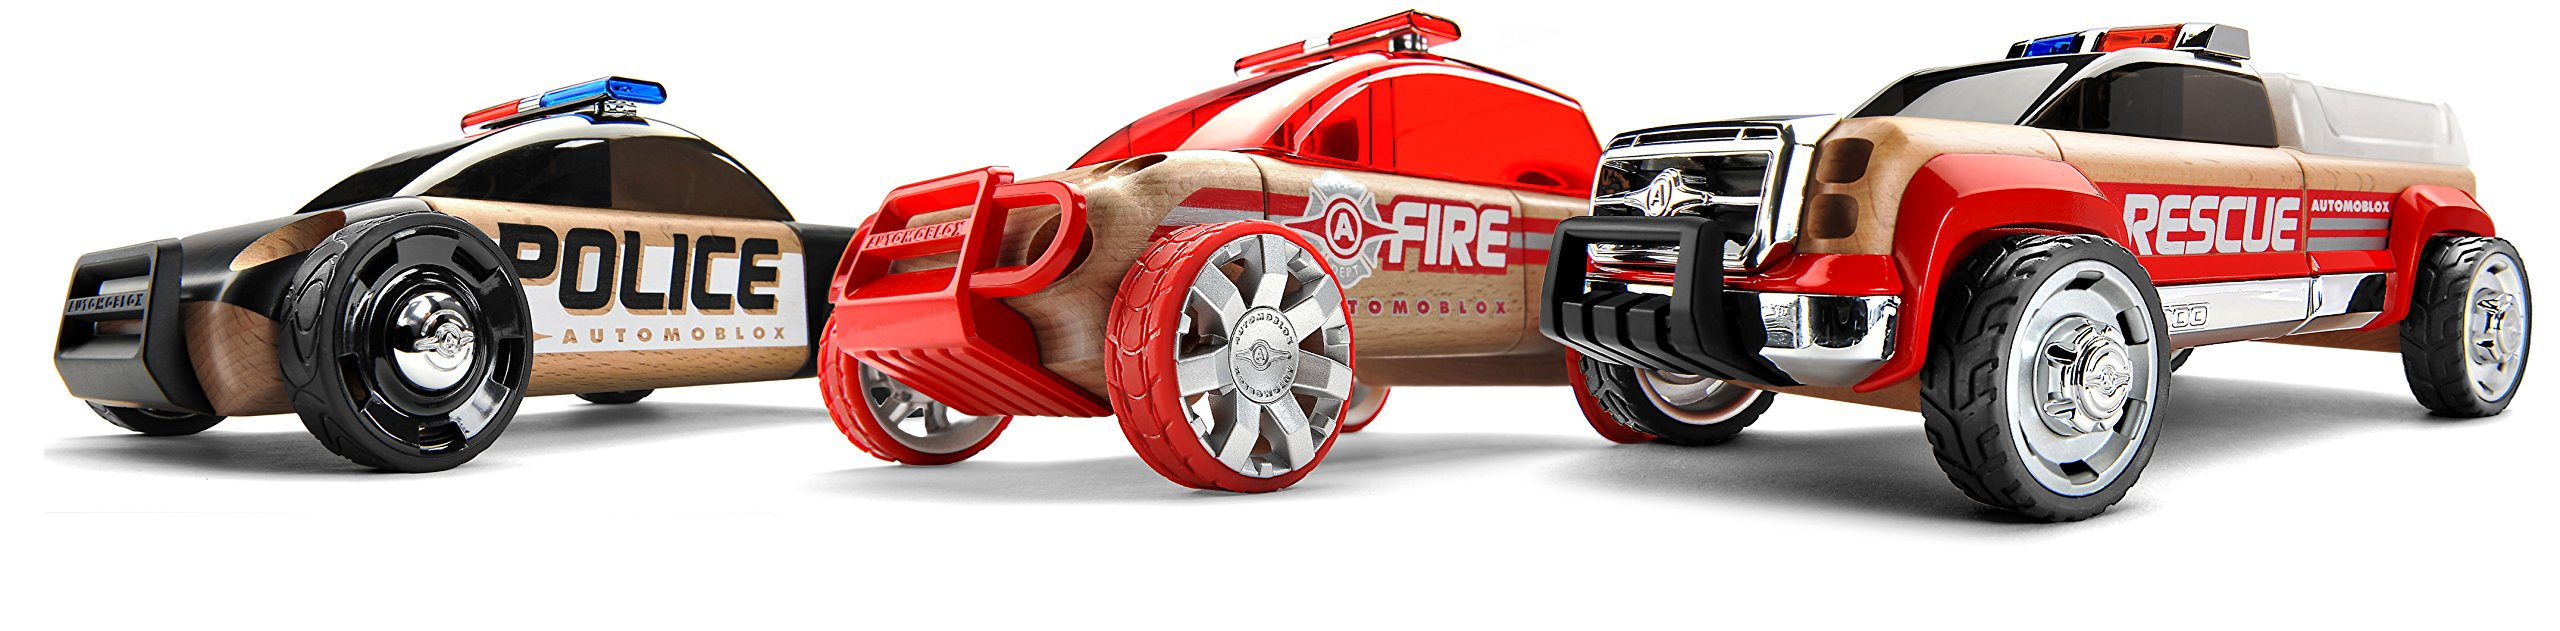 Automoblox Mini Emergency Playset (3-Pack)